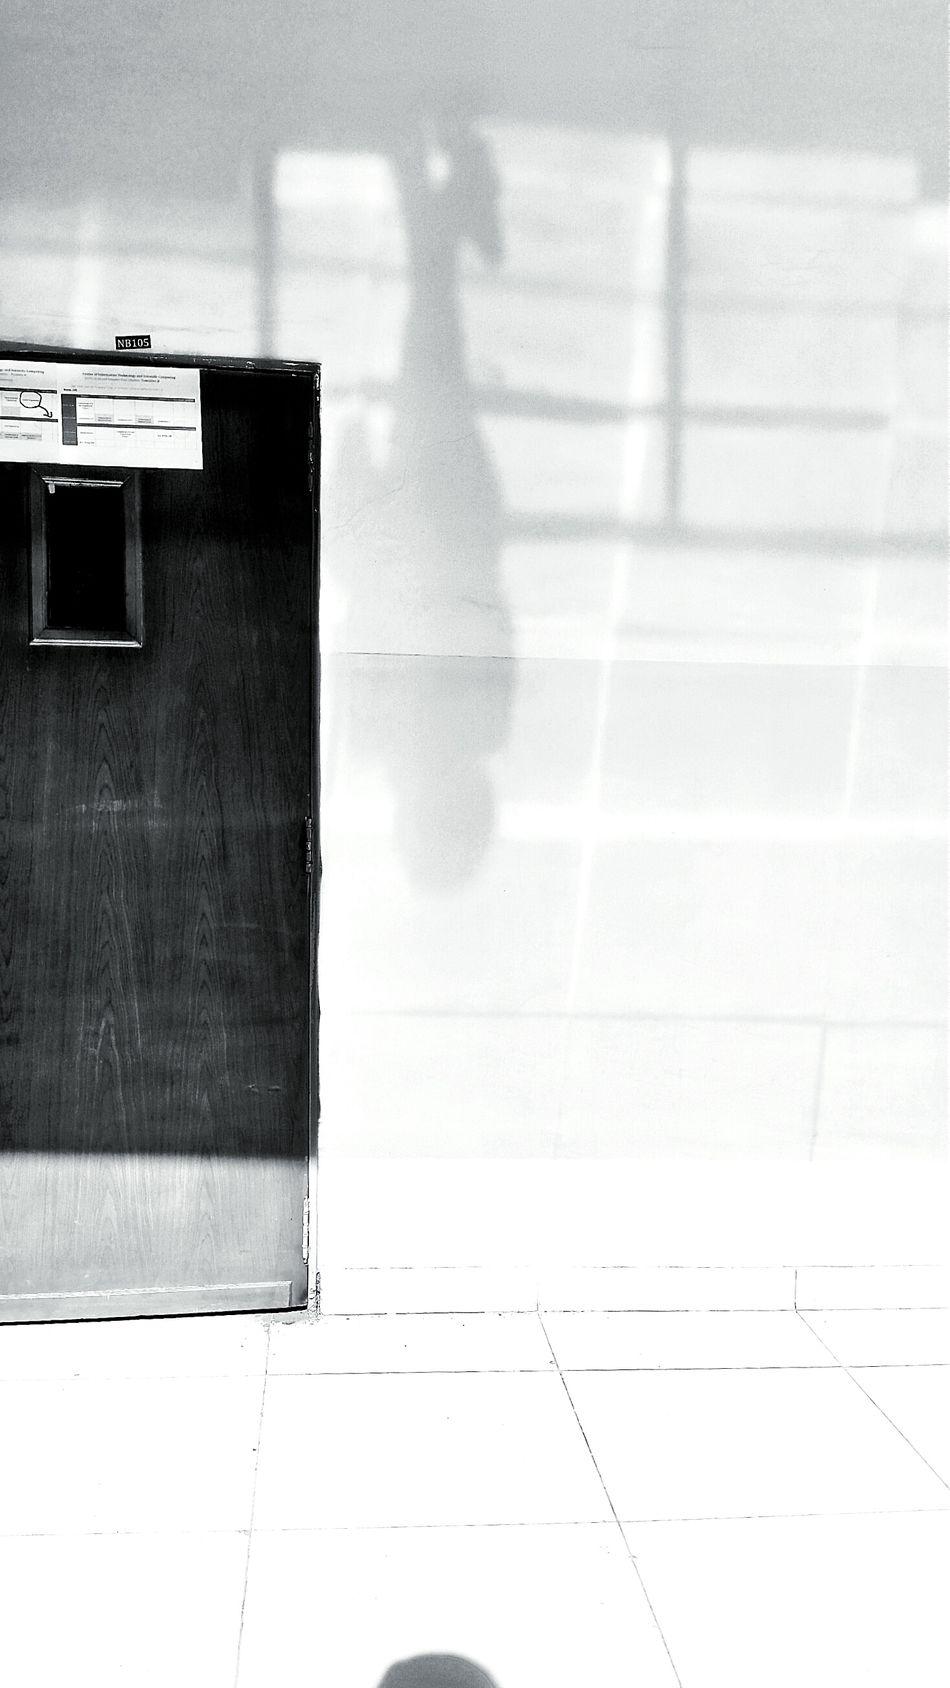 Reflection Black&white B&w Randomshot Phonecamera Addis Ababa Random School Reflections Waiting ... Shadow ShadowMe The City Light